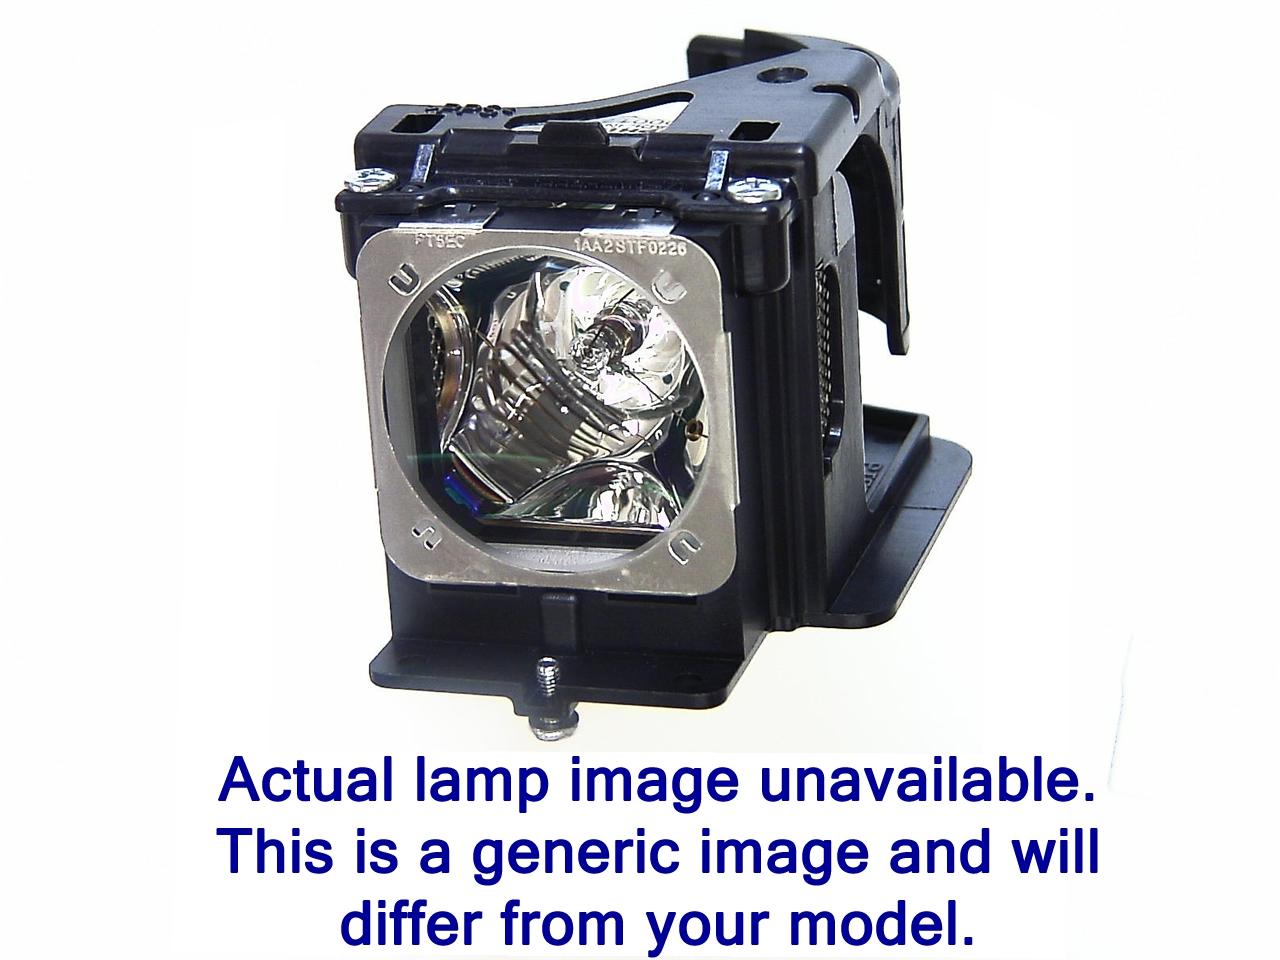 Lampking Cus In116x Infocus In104 Projector Lamp